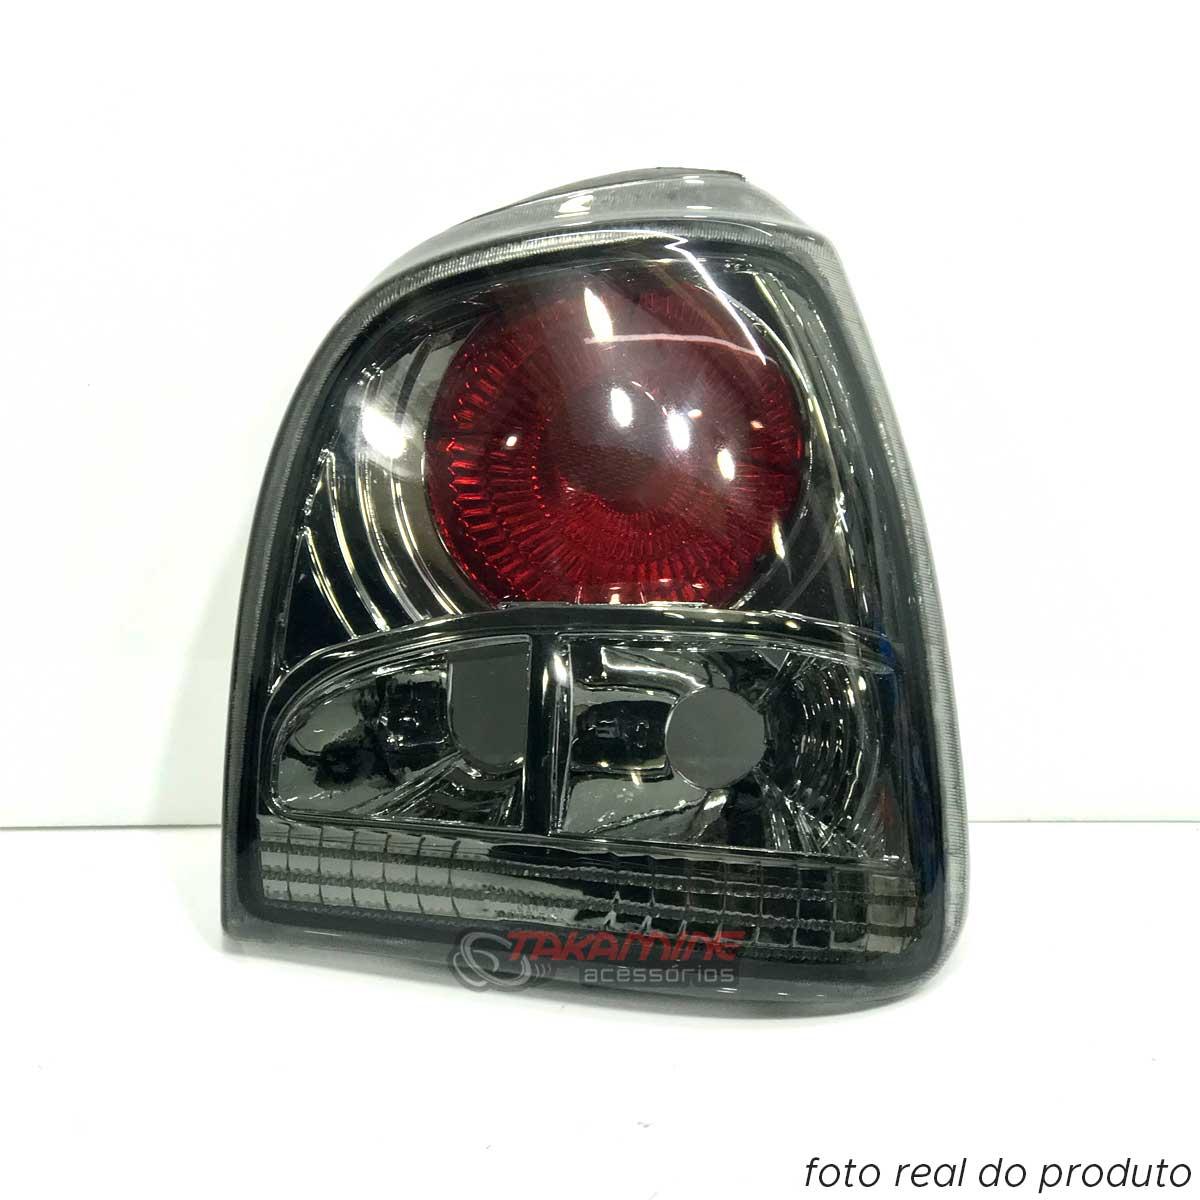 Lanterna traseira Gol Bola 1995 1996 1997 1998 1999  Evolution II fumê modelo arteb lado direito